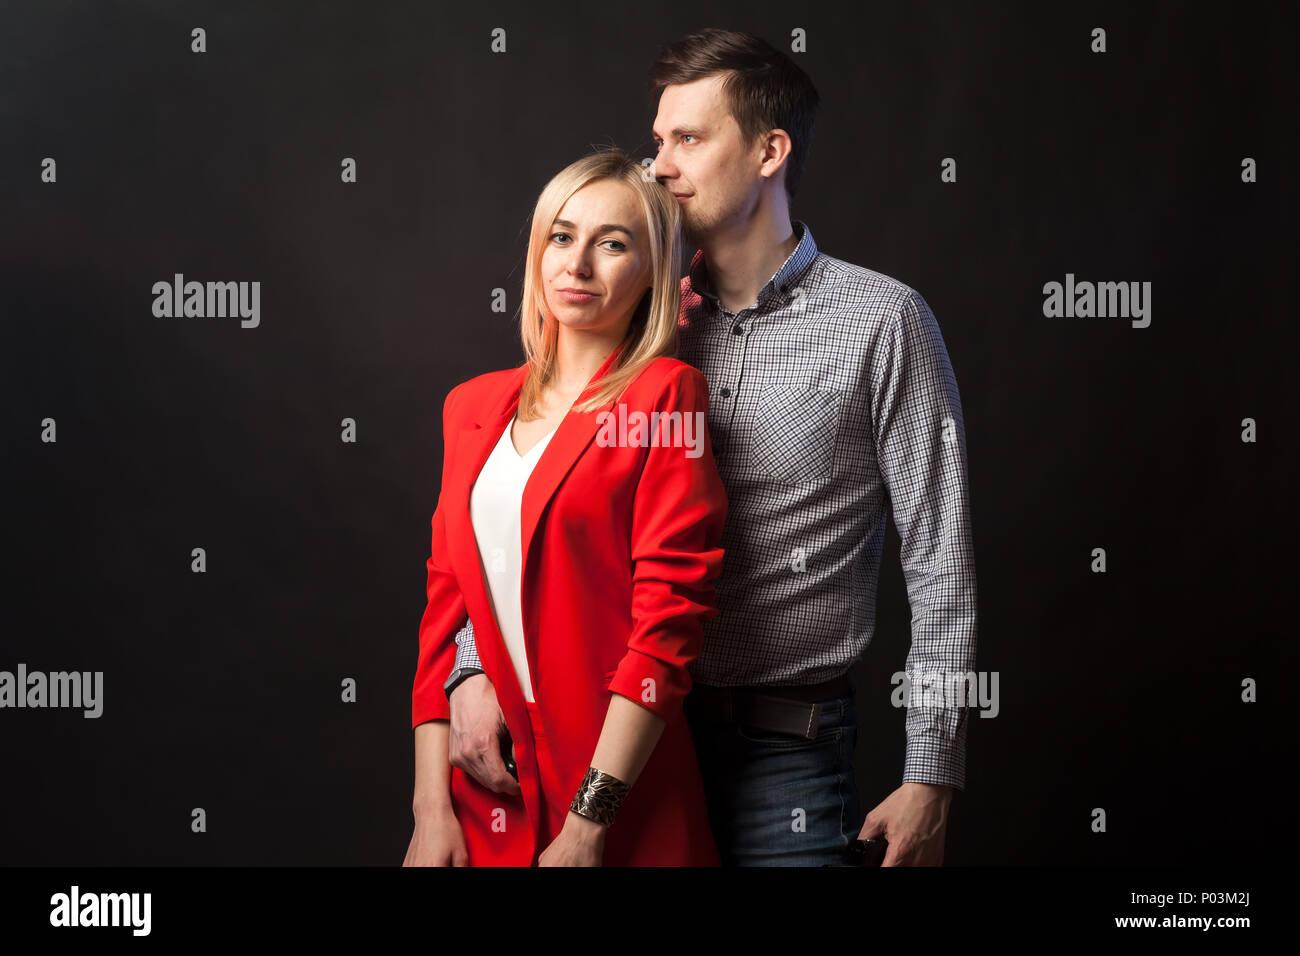 Große n schöne Dating